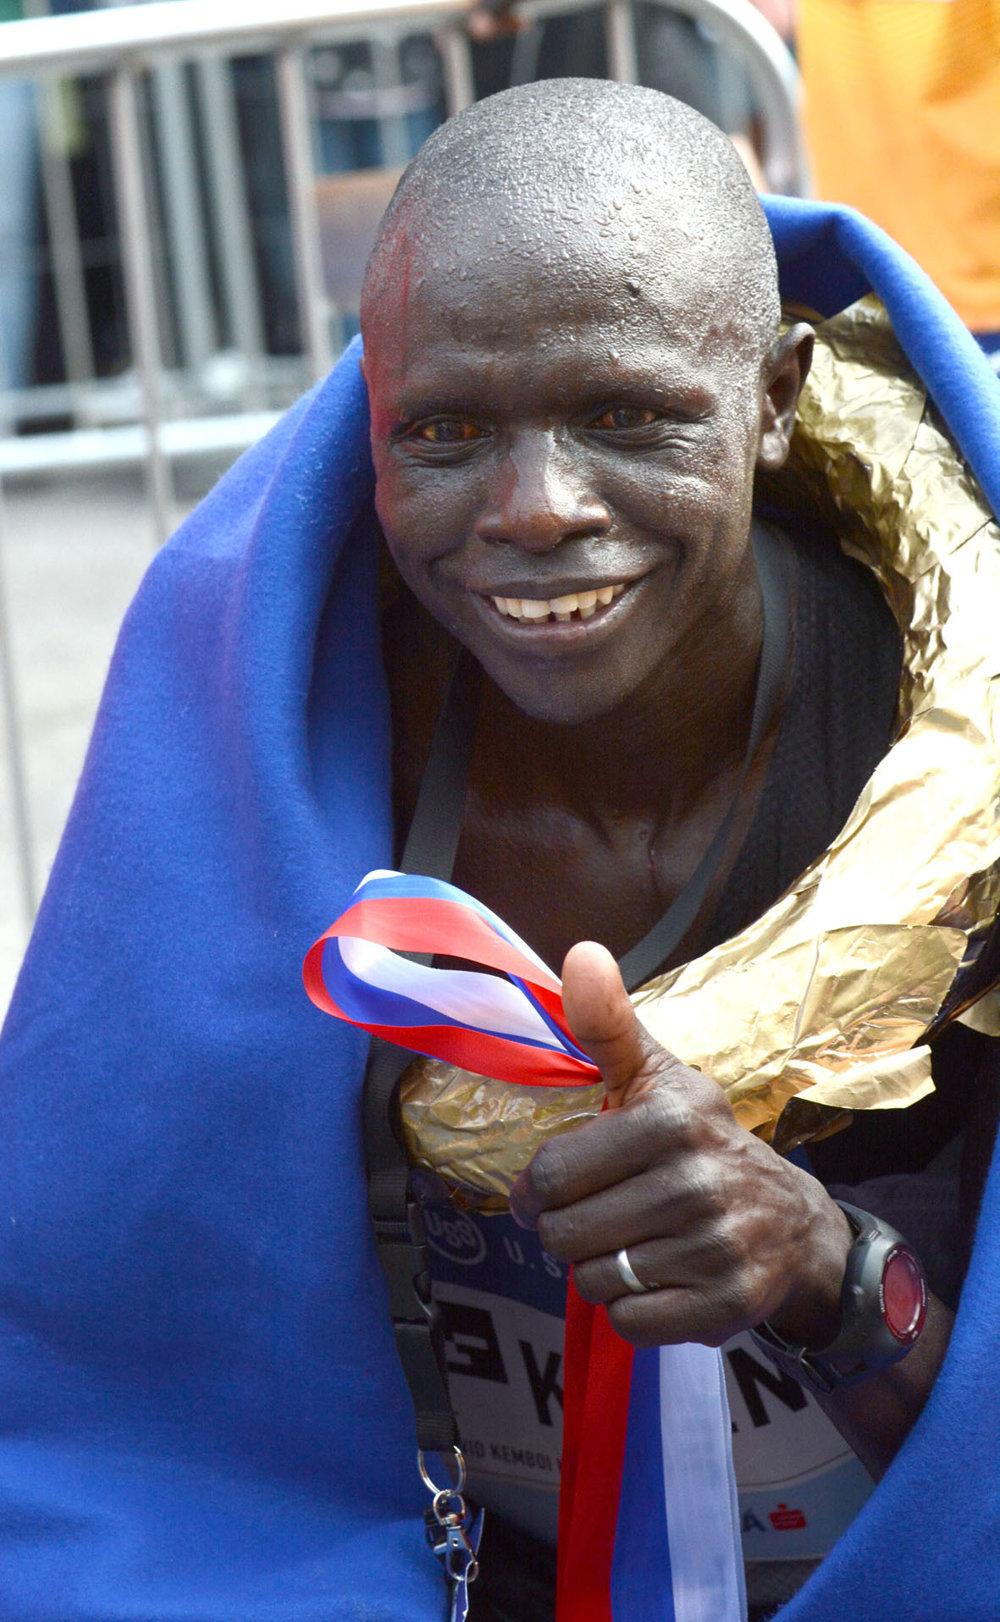 David Kiyeng, víťaz košického maratónu so zlatým vencom.